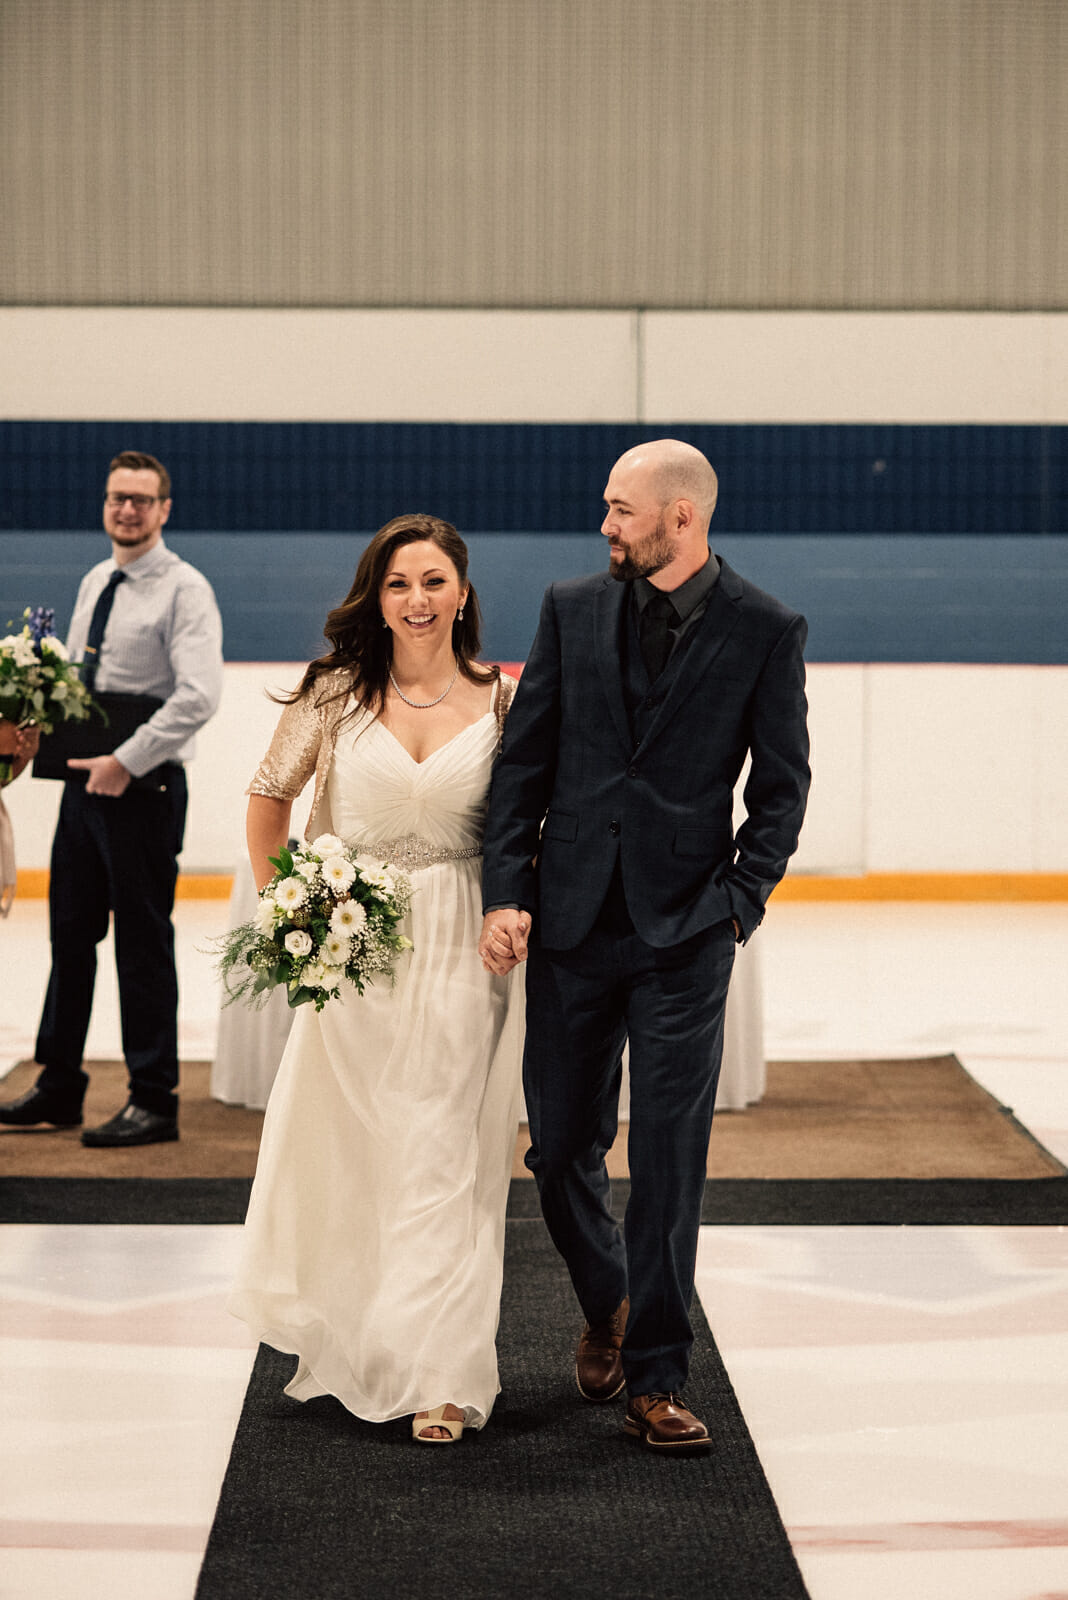 newlyweds walk down aisle on centre ice